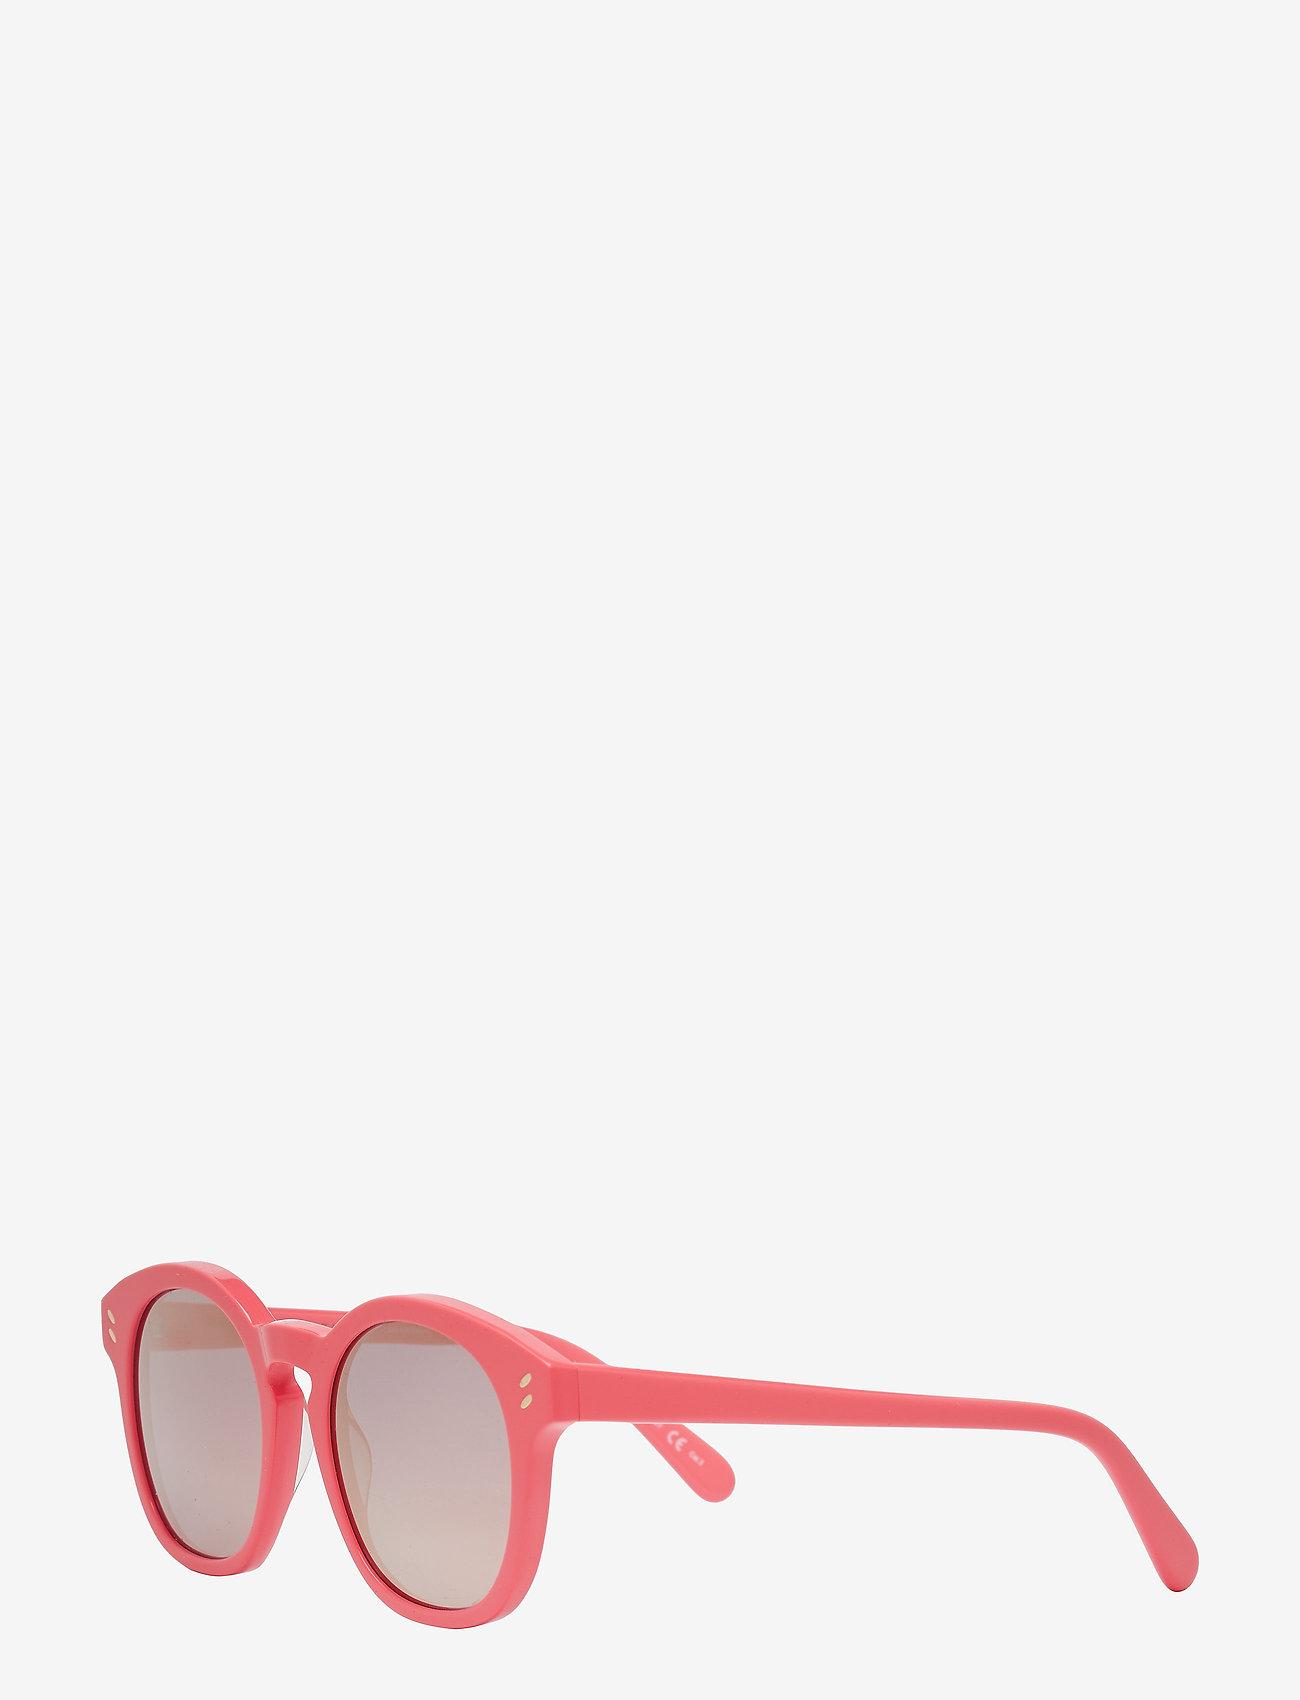 Stella McCartney Eyewear - SC0013S - ar apaļu rāmi - pink-pink-pink - 1